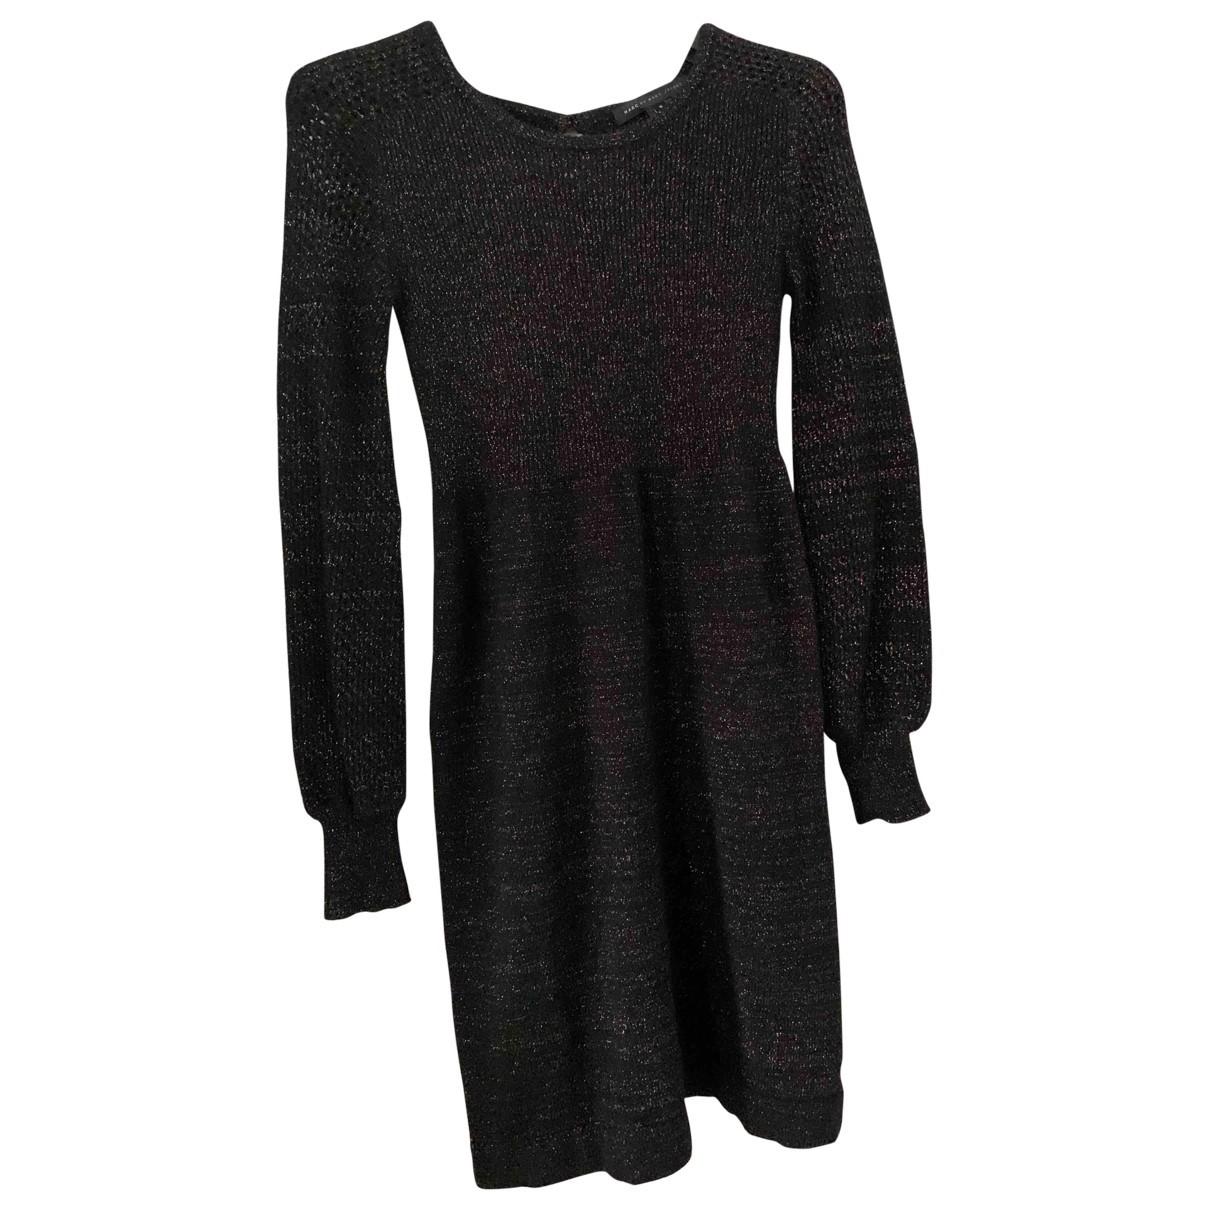 Marc By Marc Jacobs \N Black Wool dress for Women 38 FR